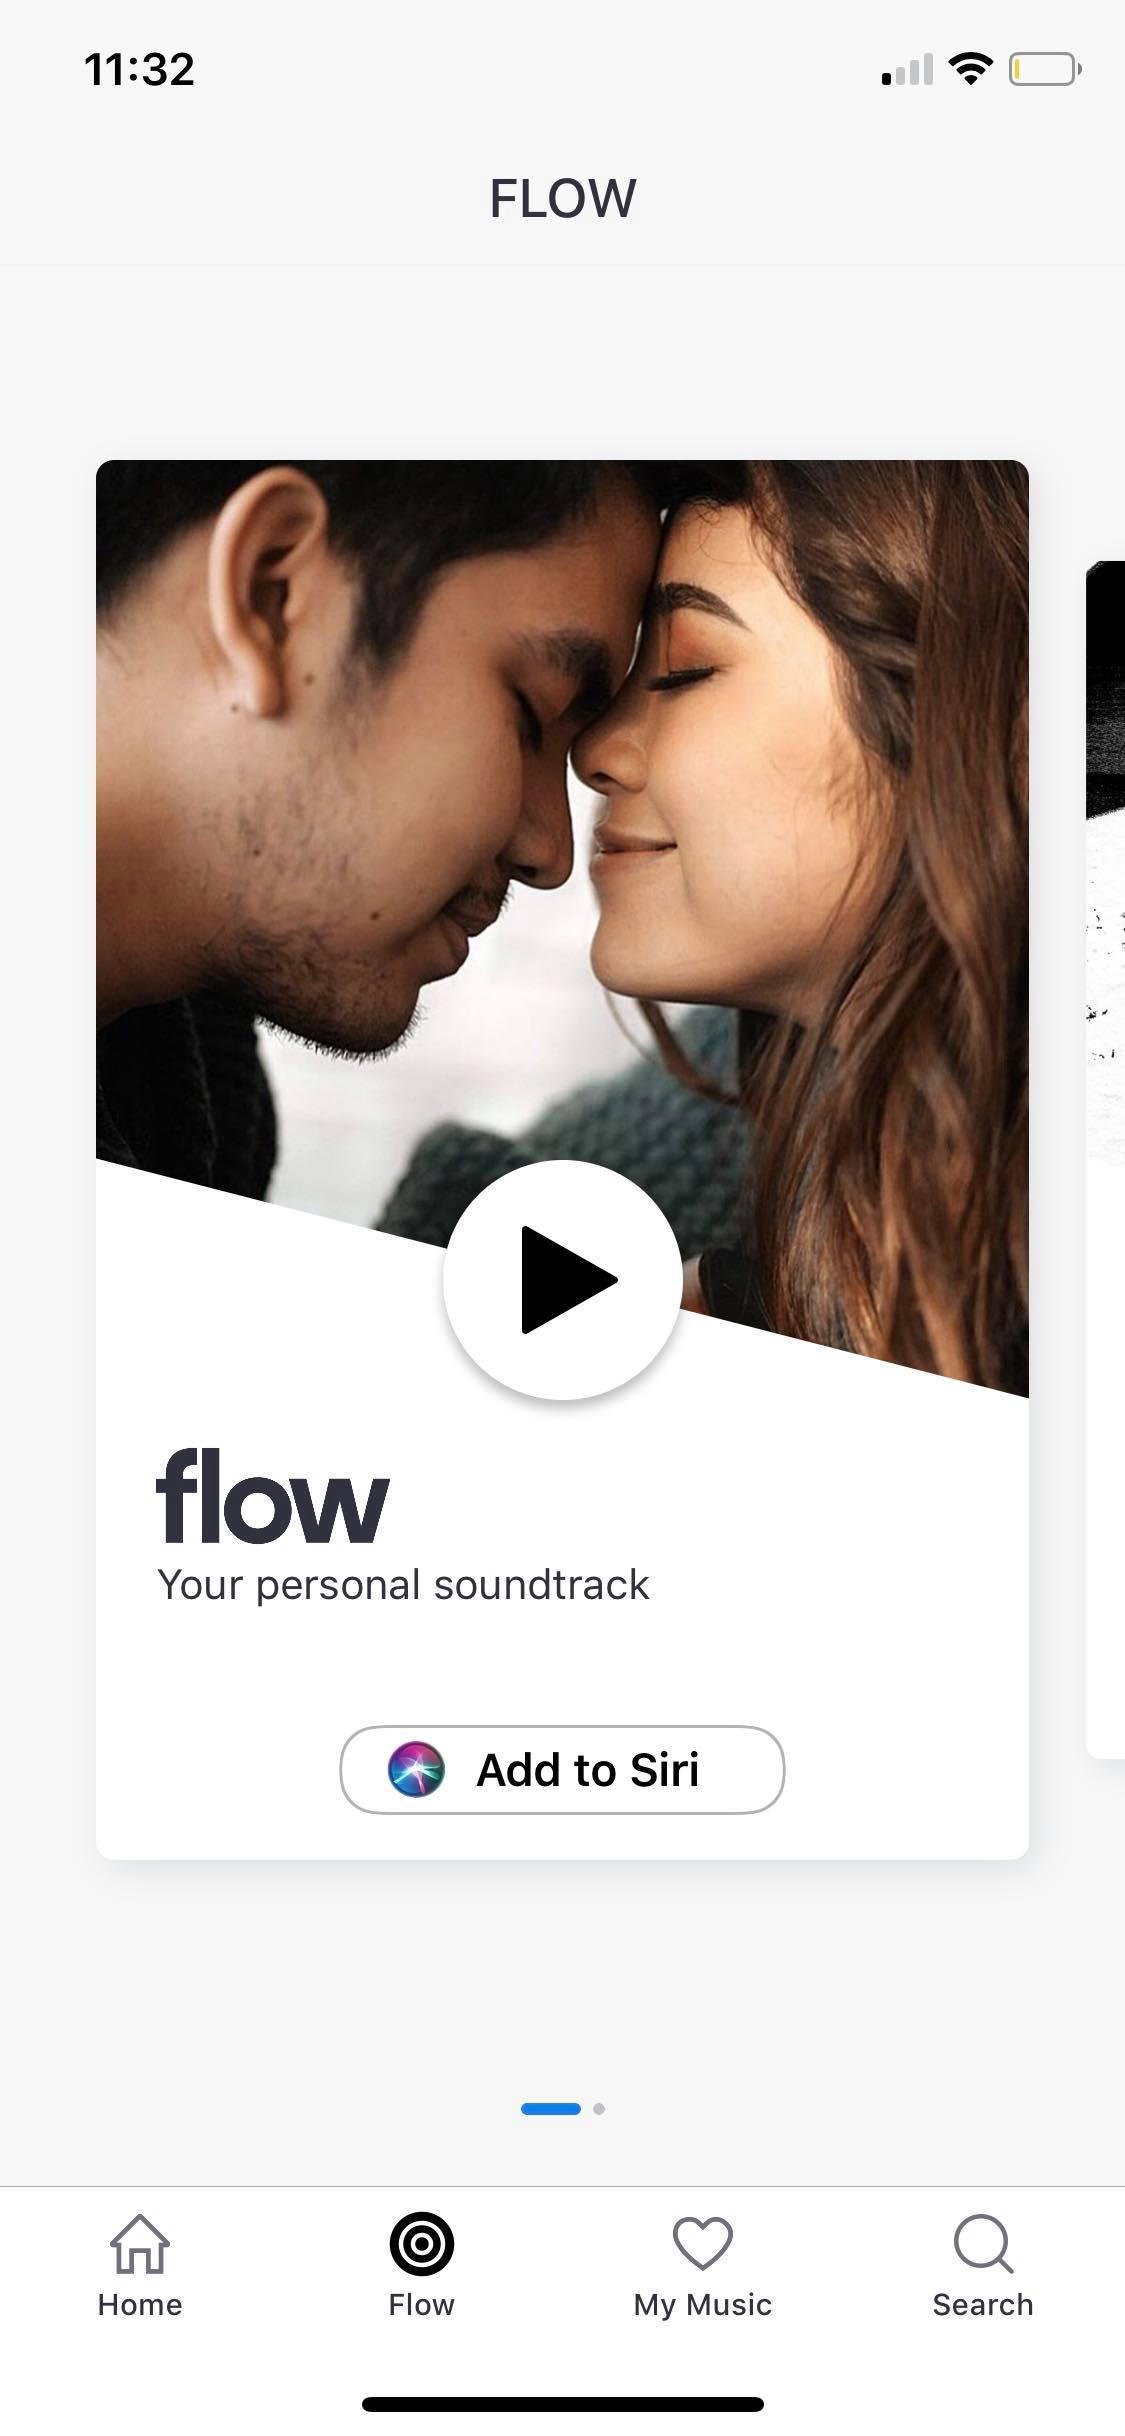 Flow on iOS by Deezer